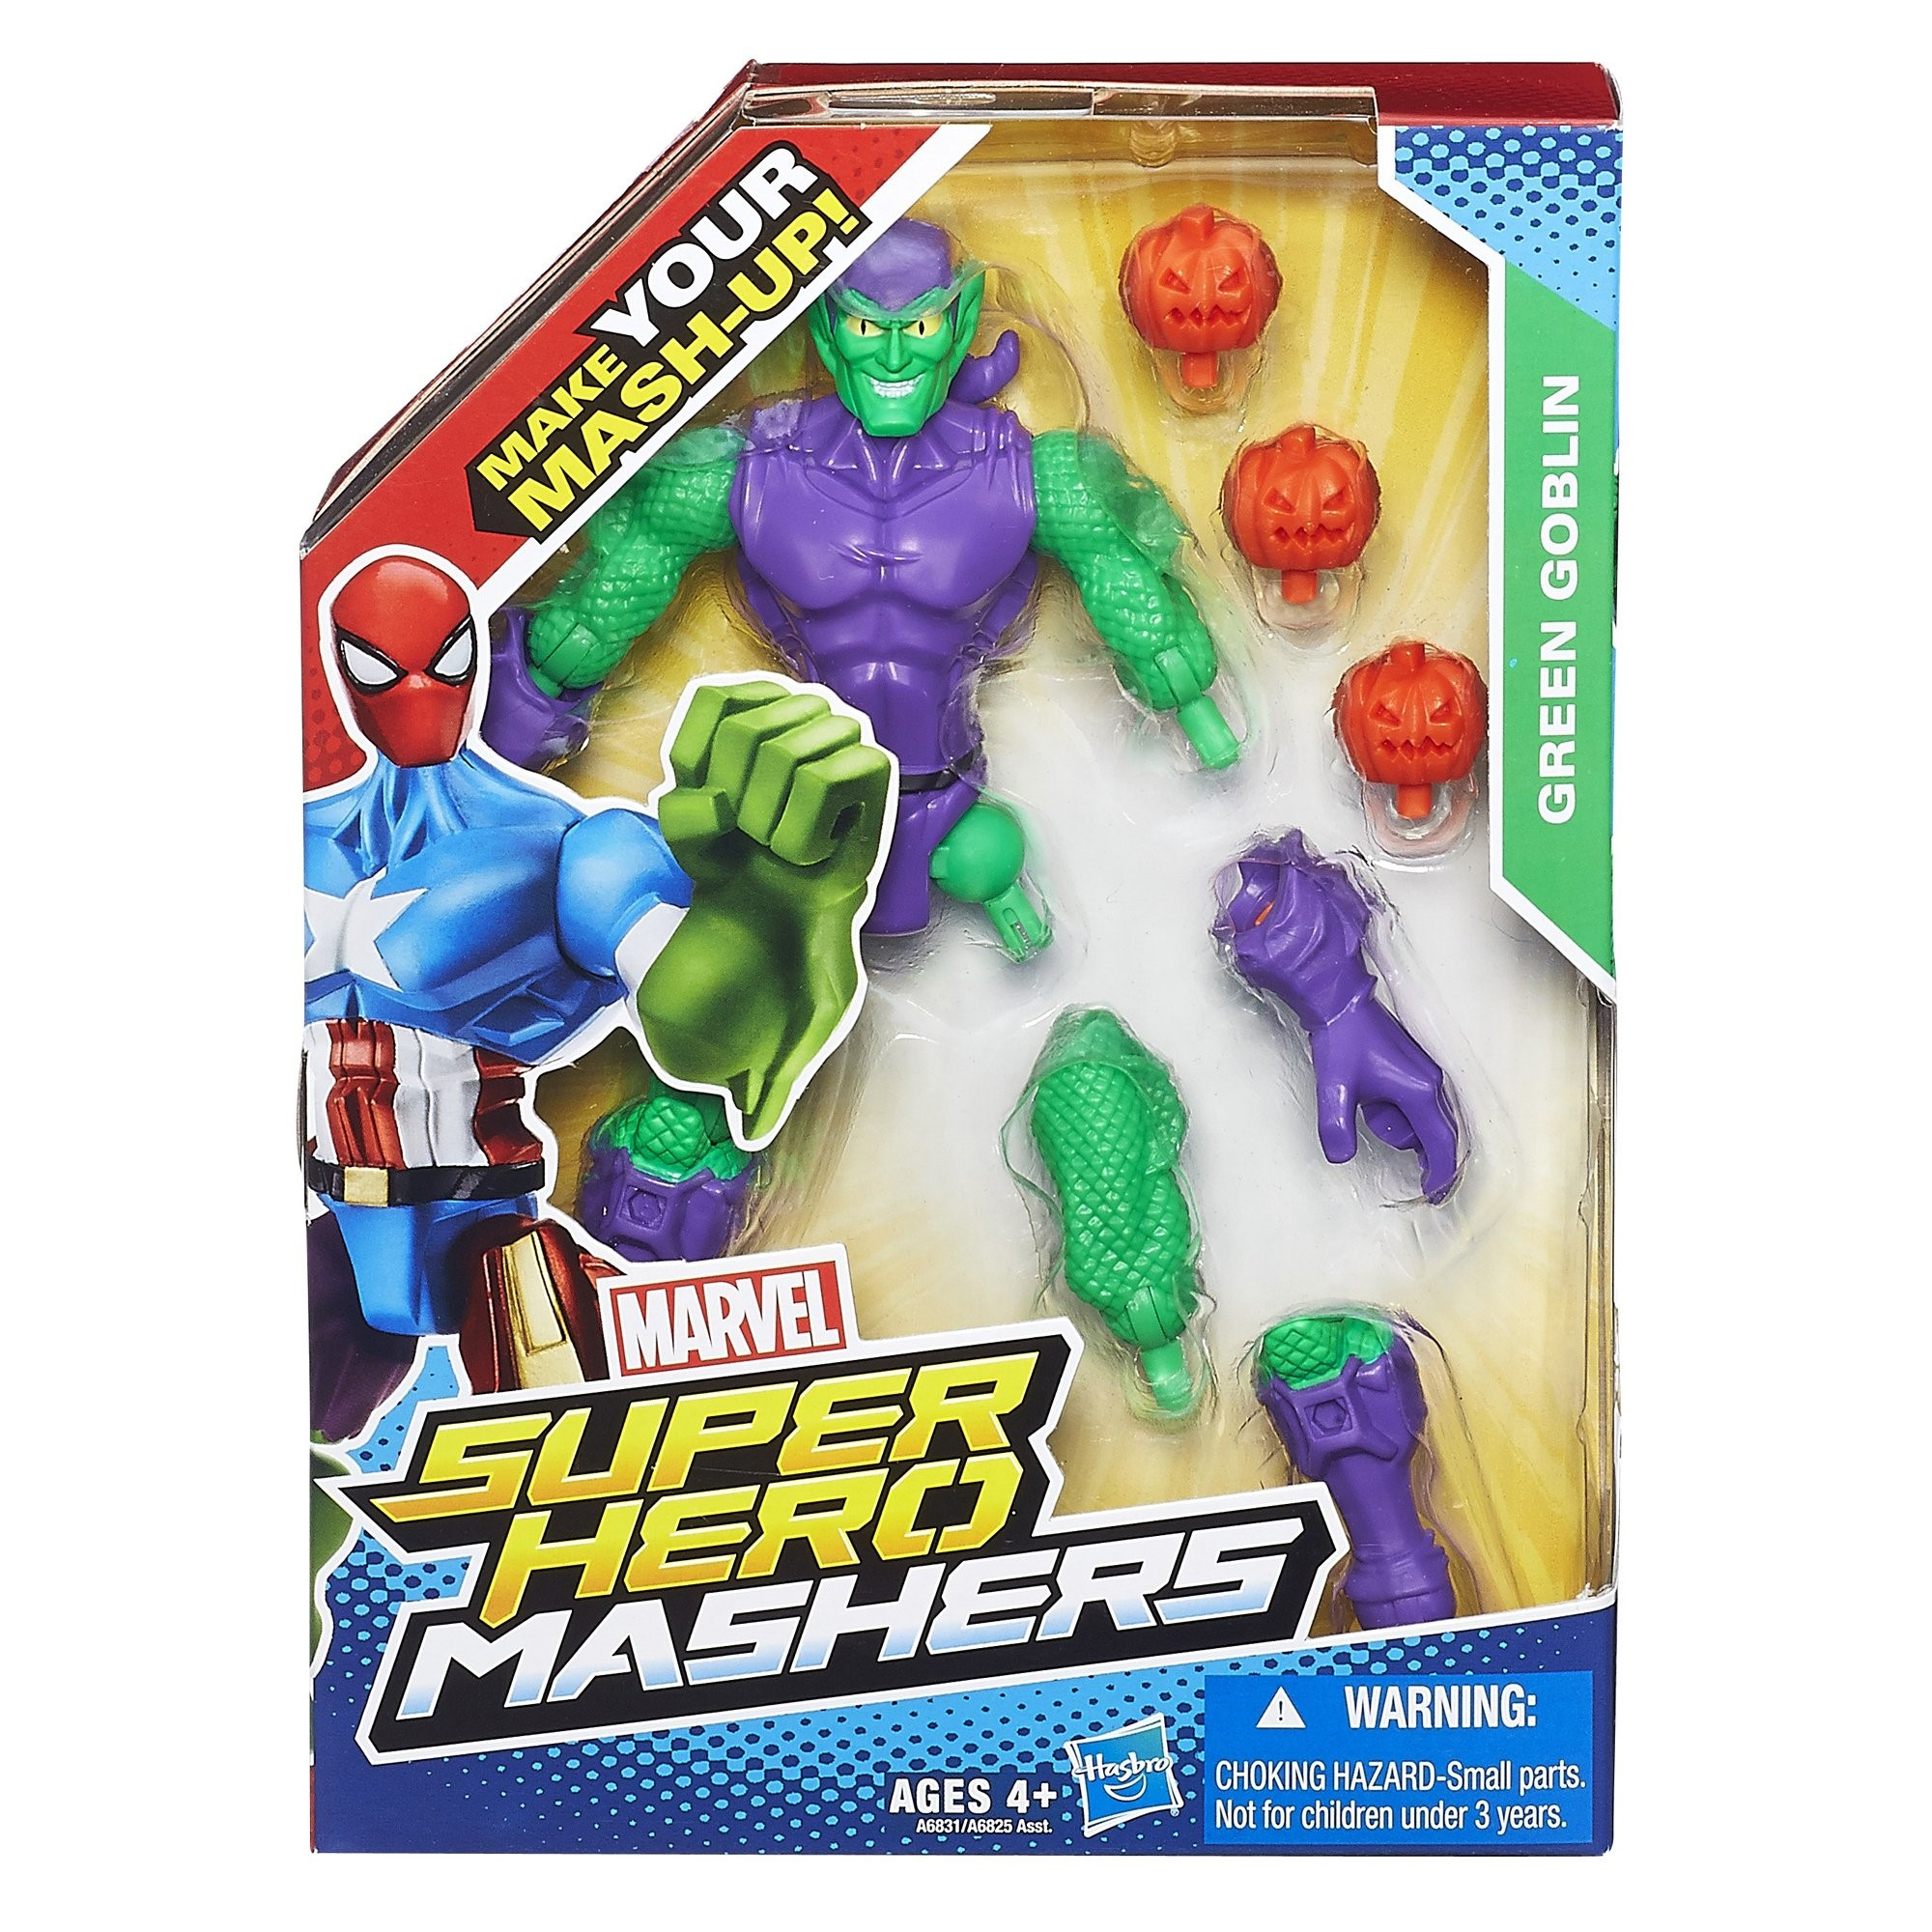 Marvel Comics Avengers Hb Green Goblin - Walmart.com